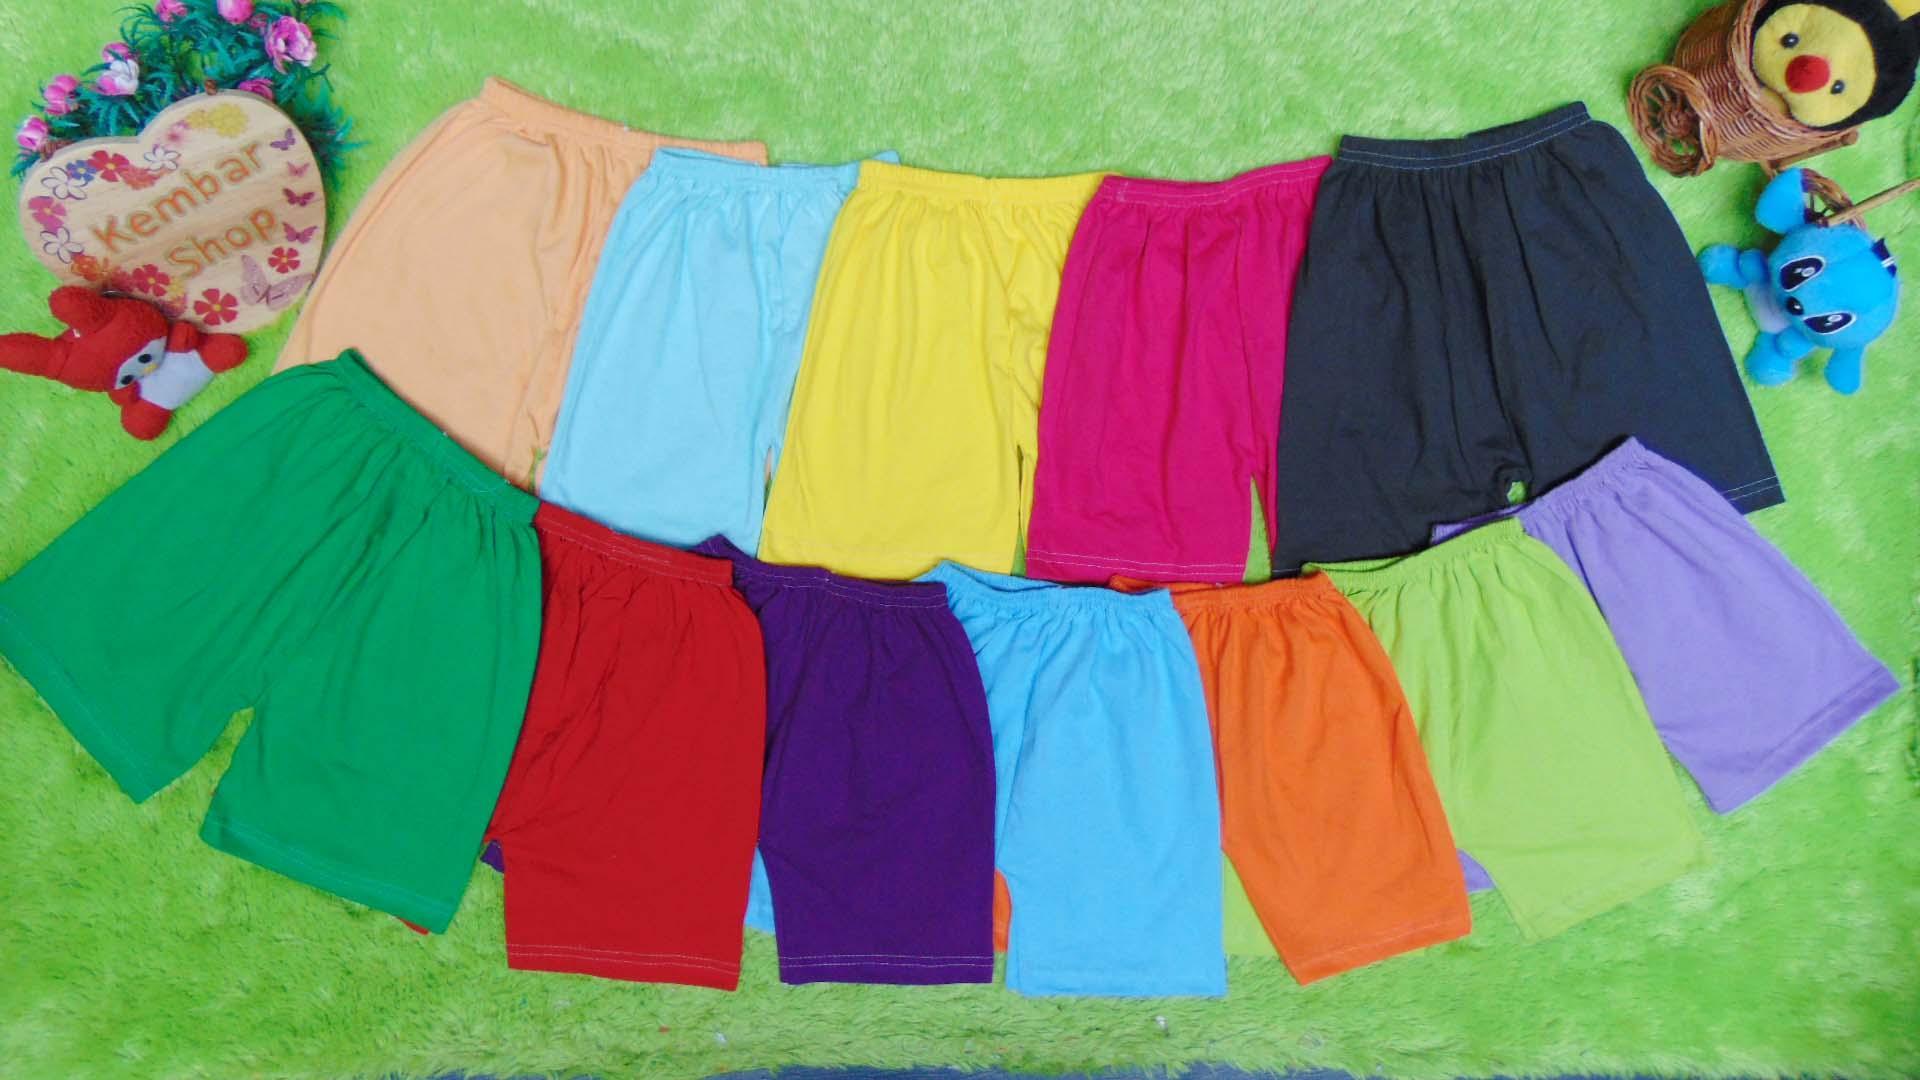 kembarshop - SUPER HEMAT Selusin Celana Pendek Anak bayi batita all size 1-3th RAINBOW